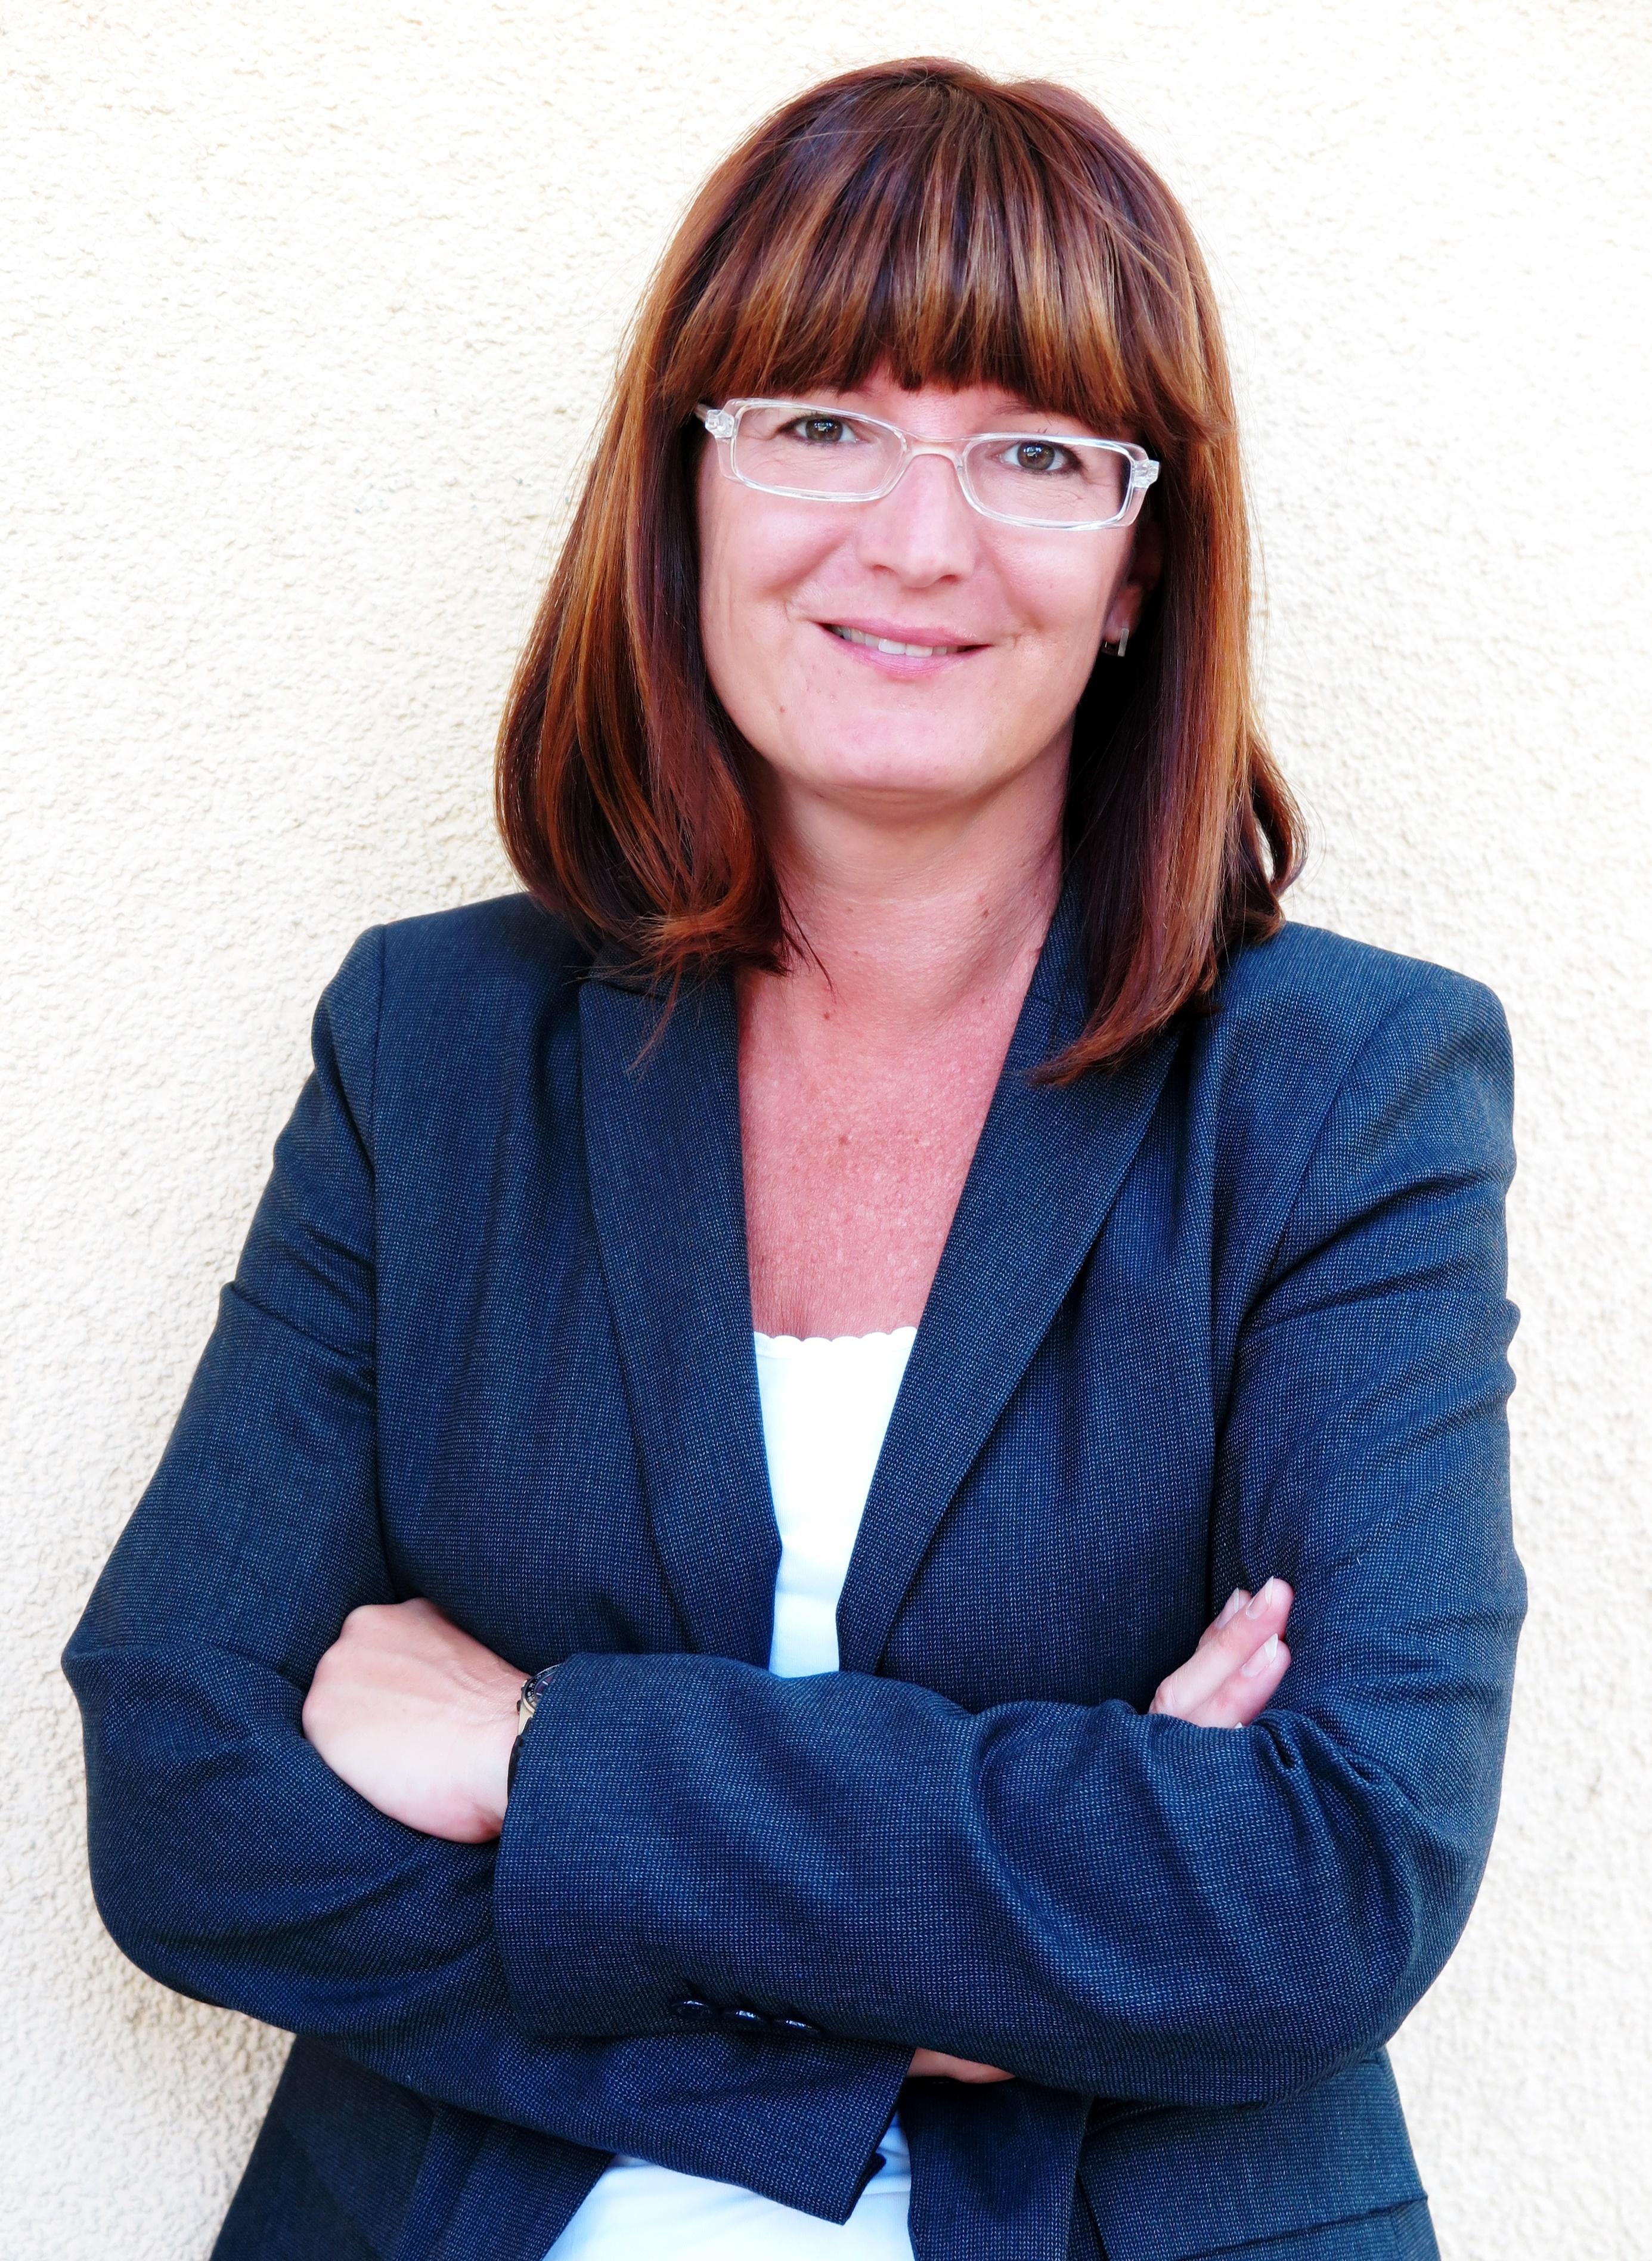 Soziologie Prof Dr Heike Ohlbrecht